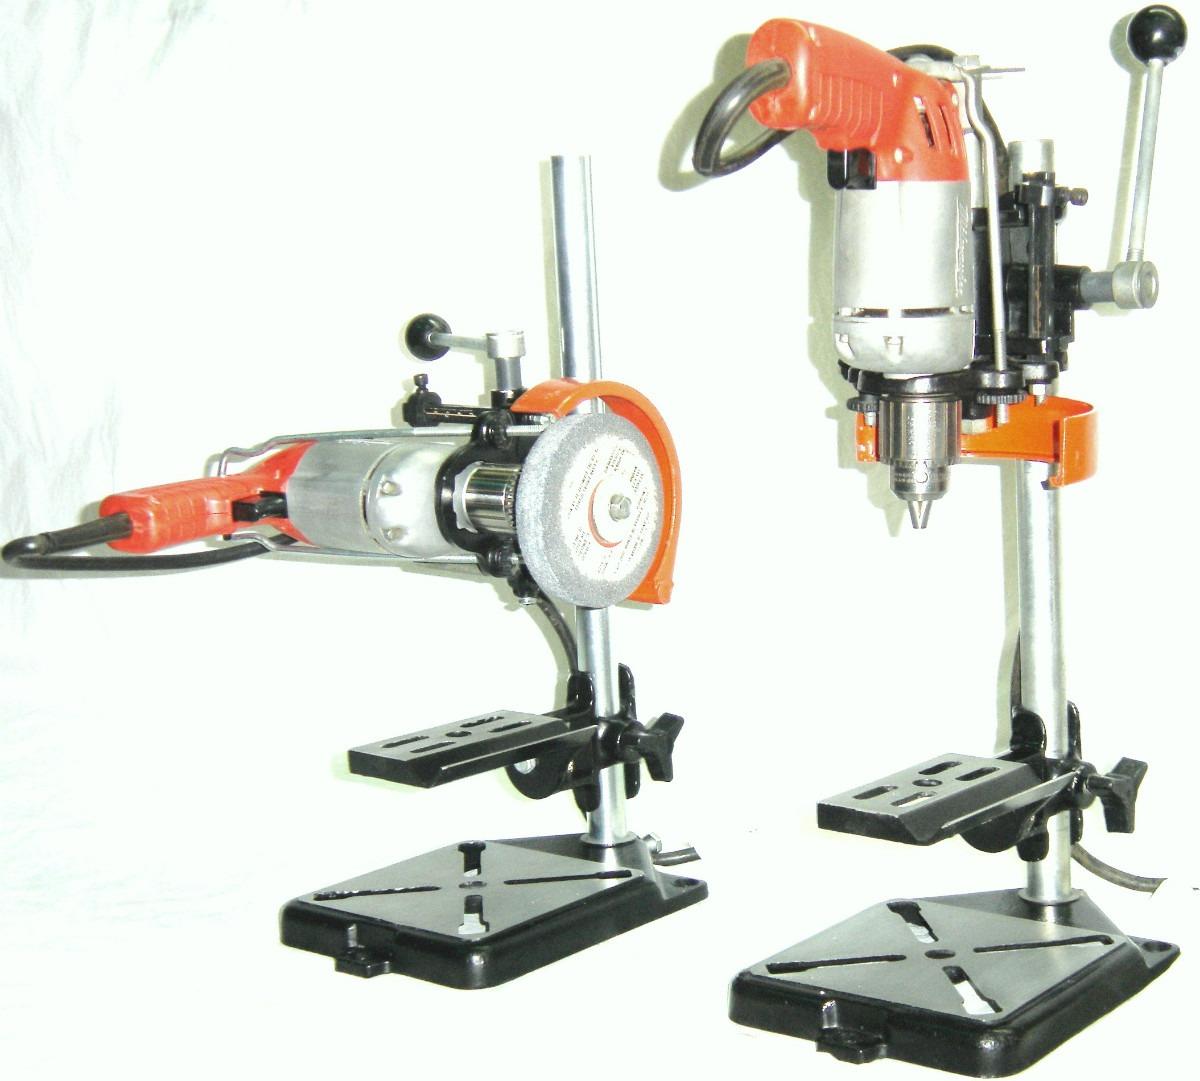 Pin taladro soporte vertical para electrico manual 35000 - Soportes para taladro ...